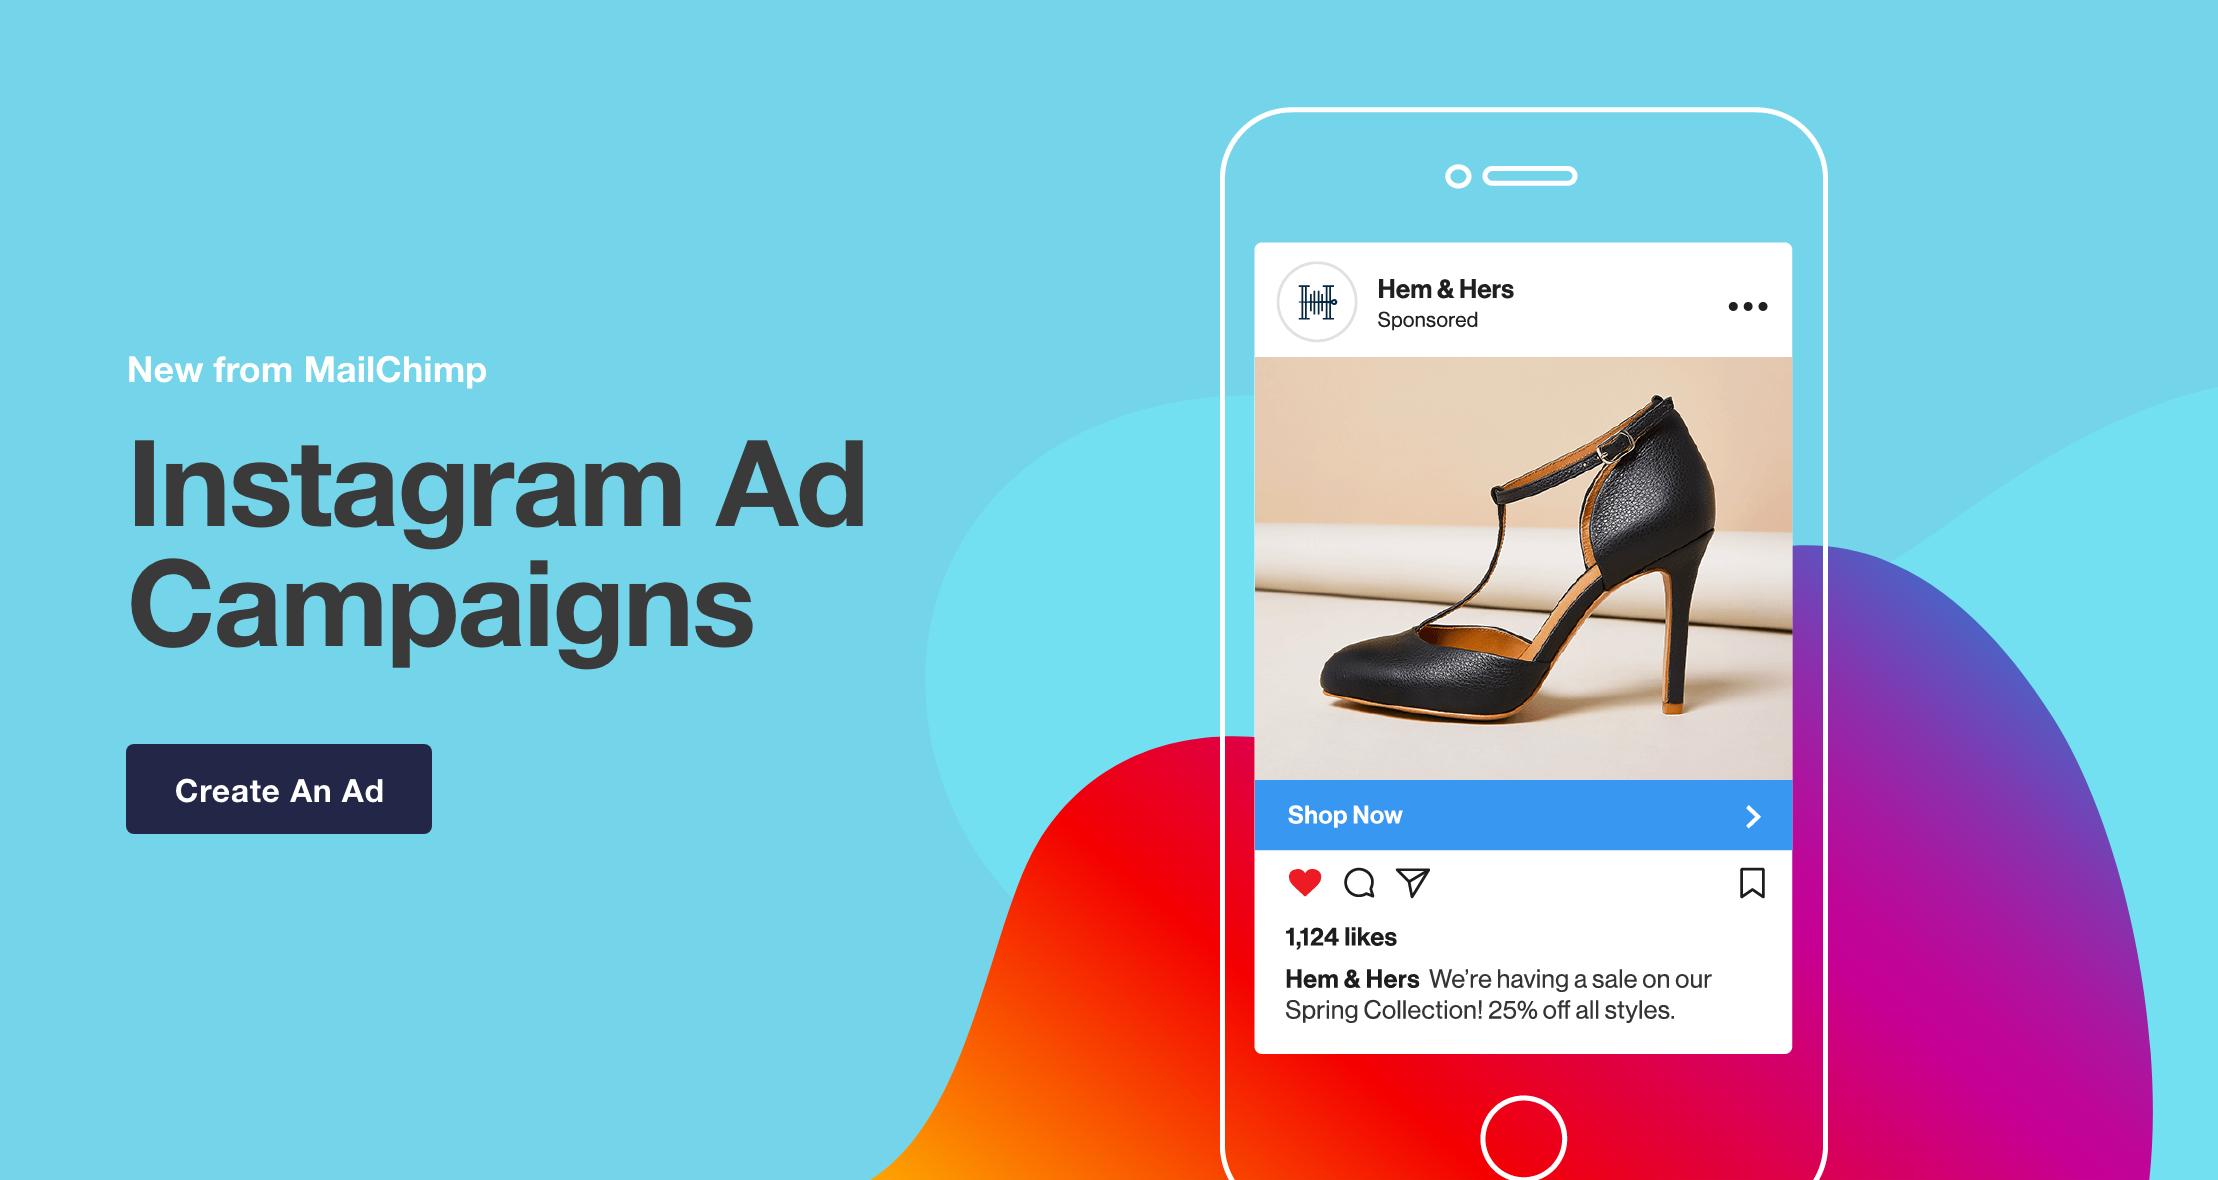 https://www.advertisemint.com/wp-content/uploads/2017/06/instagram-ad-mailchimp.png